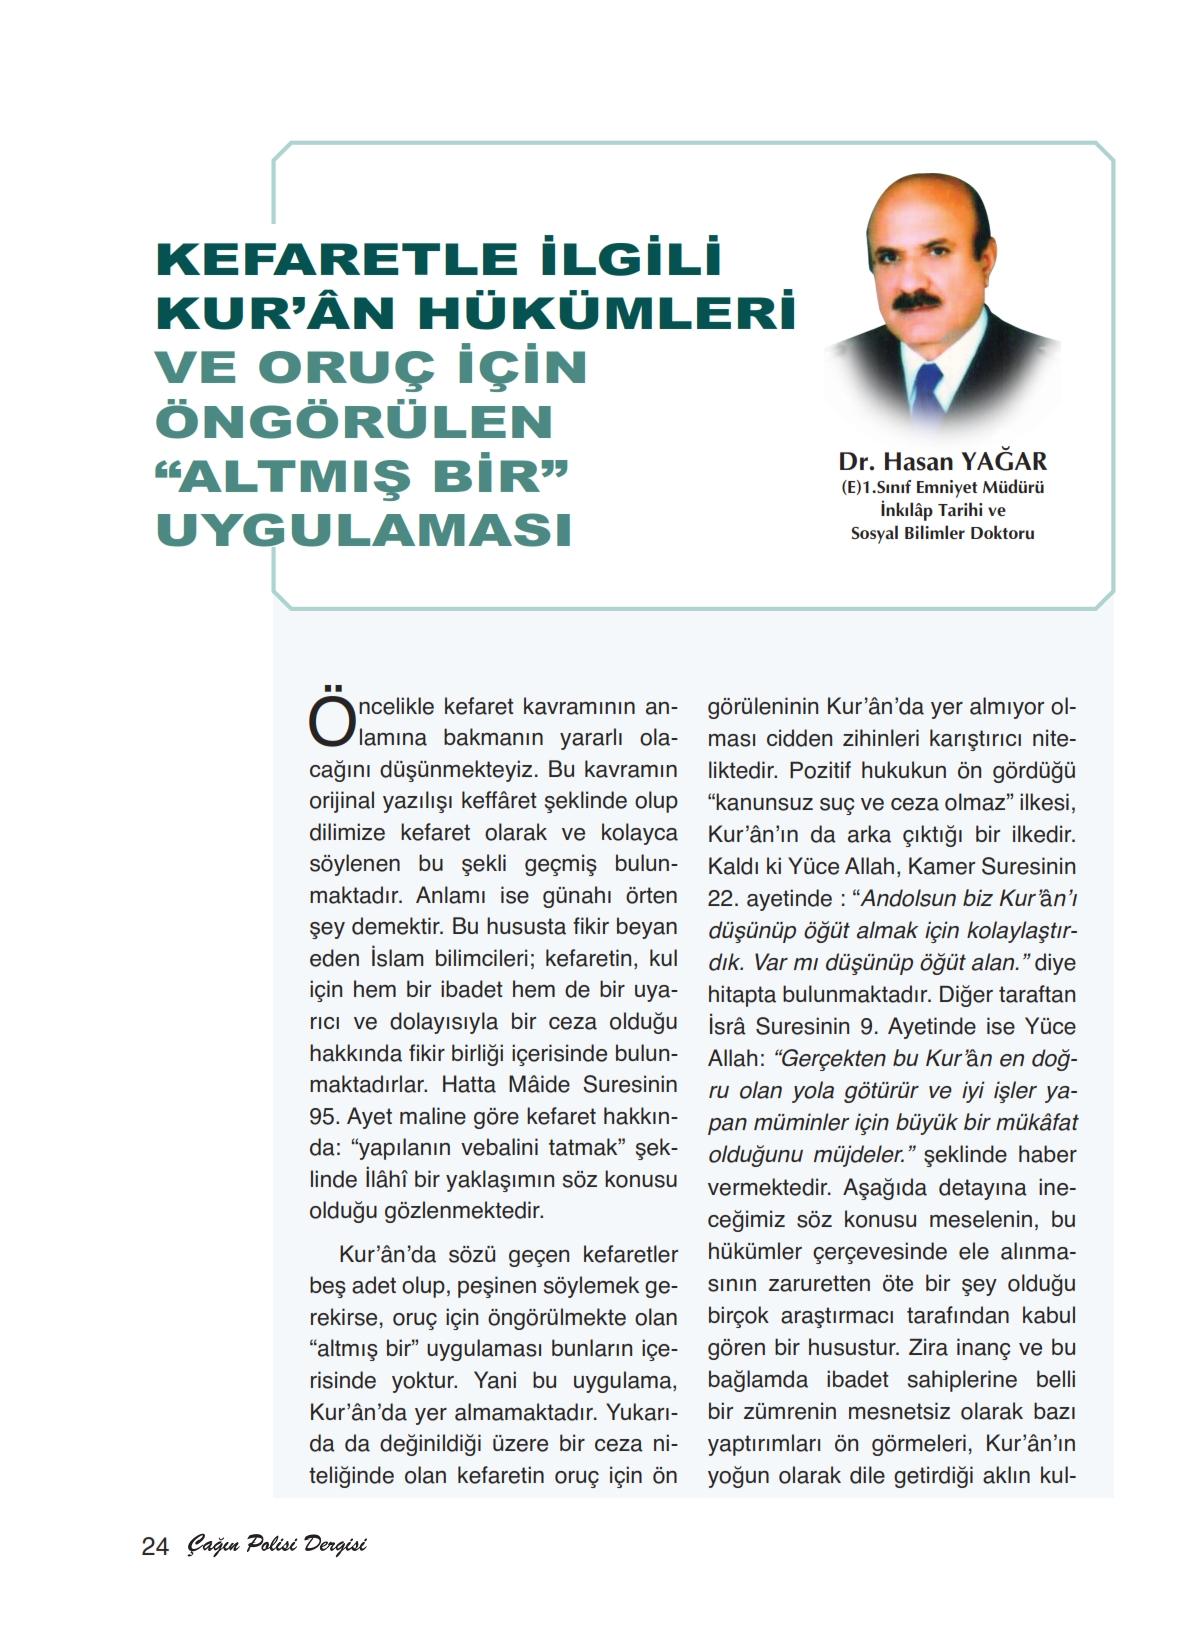 polis_dergi_aralik_2013_int_026